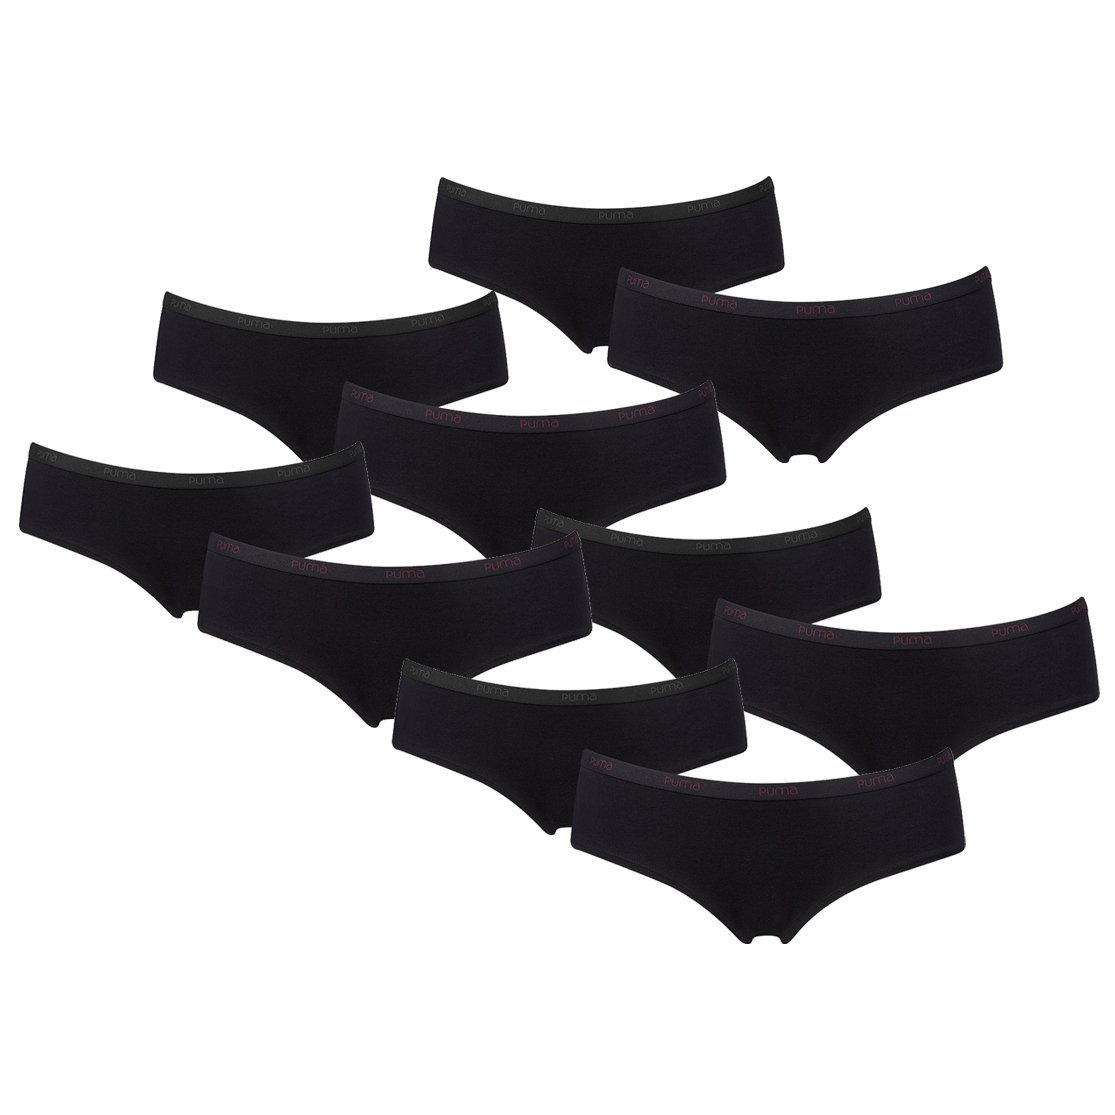 PUMA Damen Basic Hipster Unterhose 10er Pack kaufen